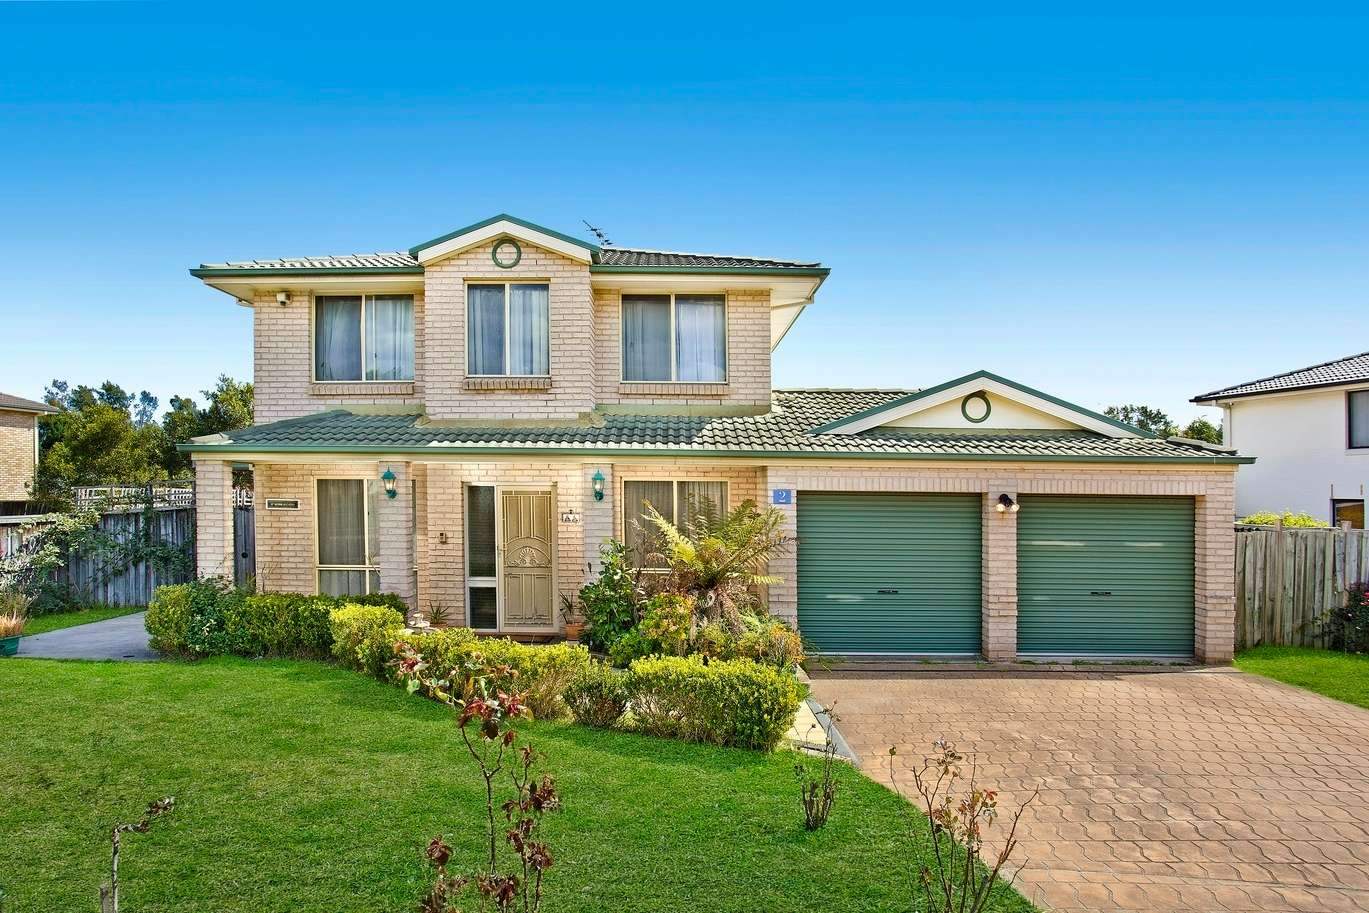 Main view of Homely house listing, 2 Milparinka Avenue, Glenwood, NSW 2768